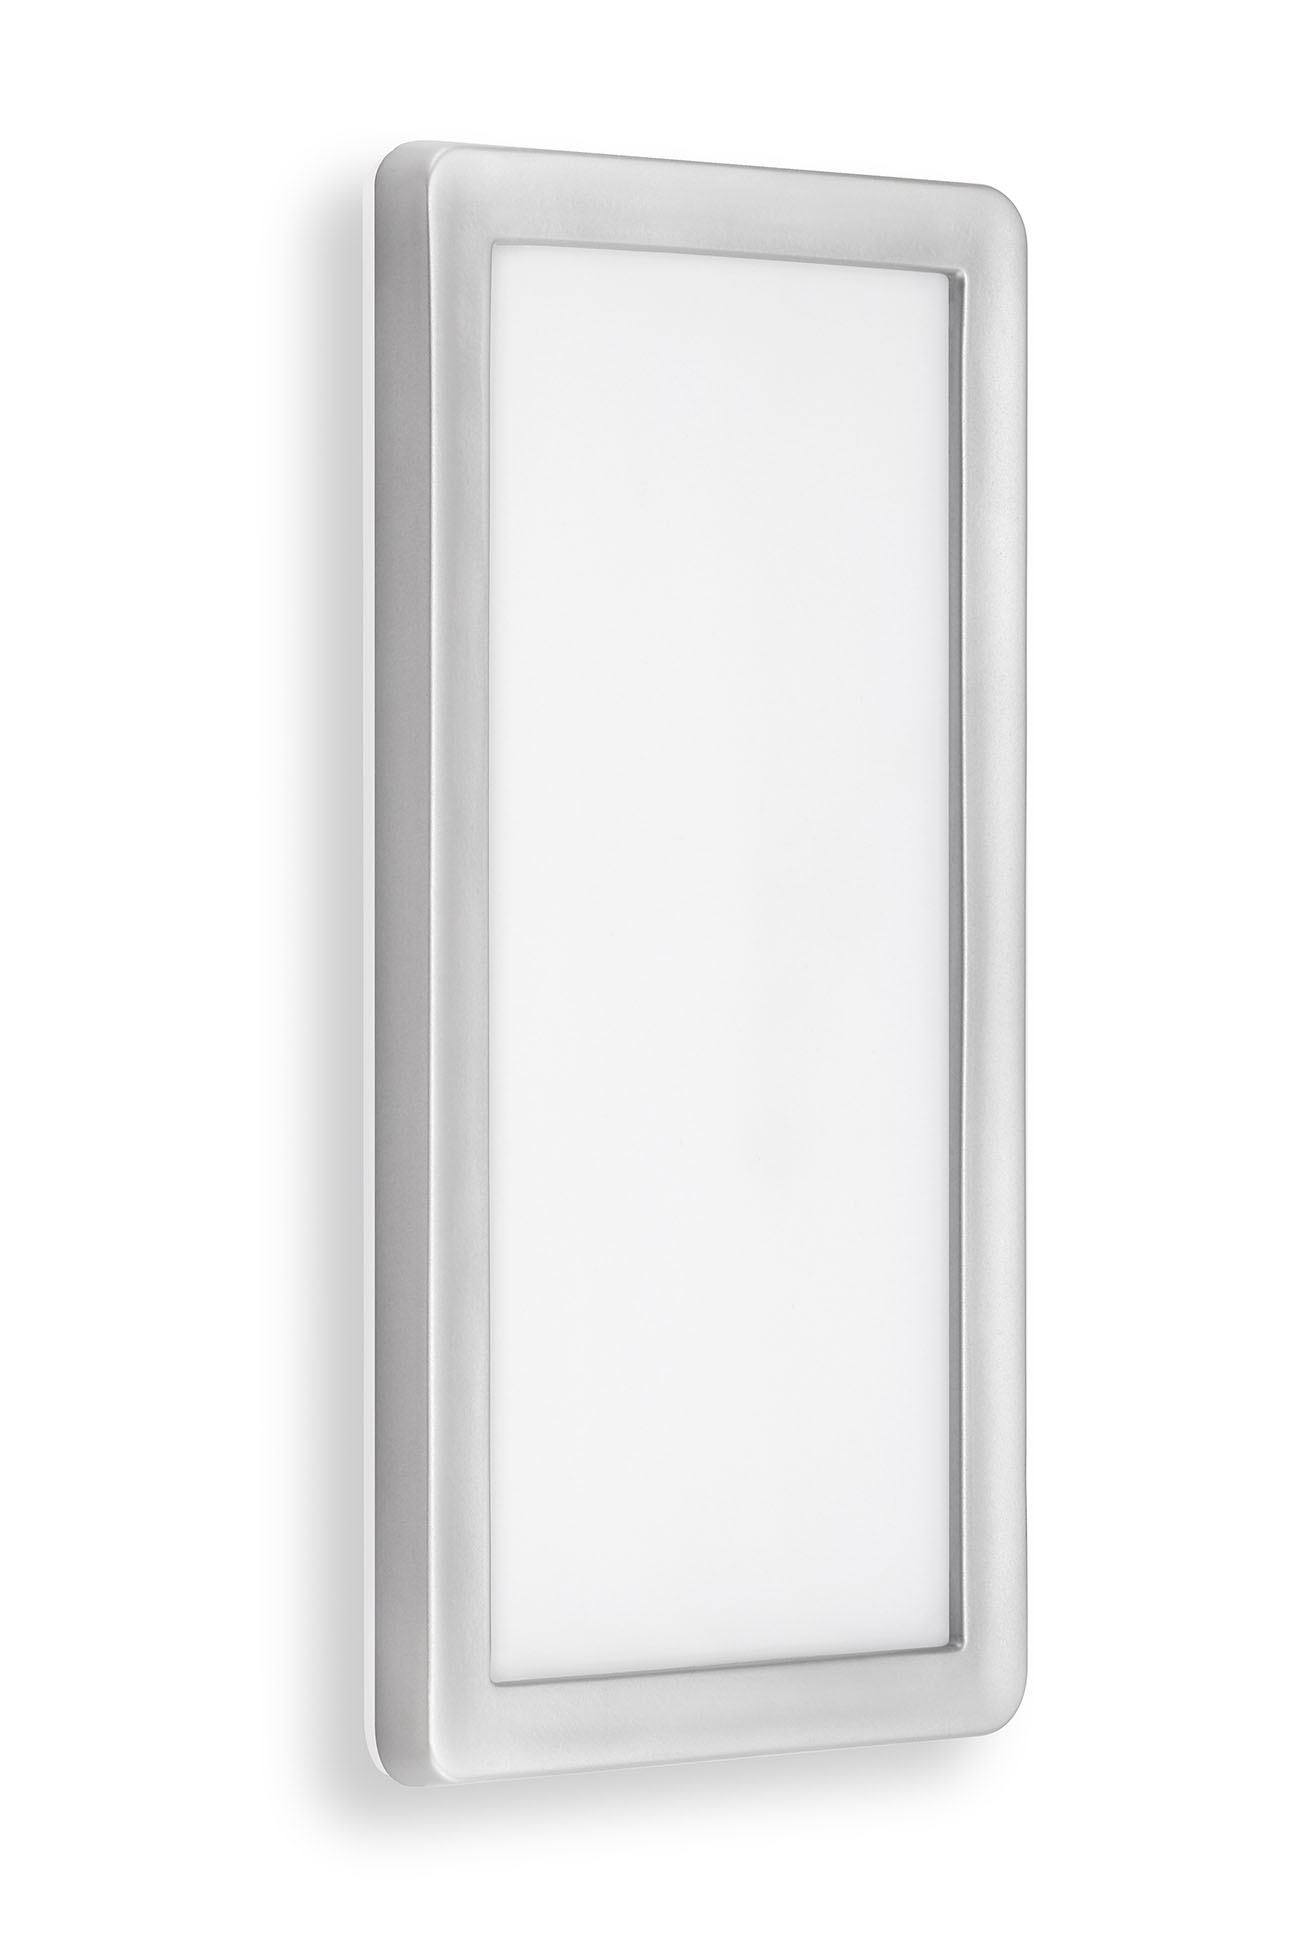 TELEFUNKEN LED Aussenwandleuchte, 28 cm, 16 W, Silber